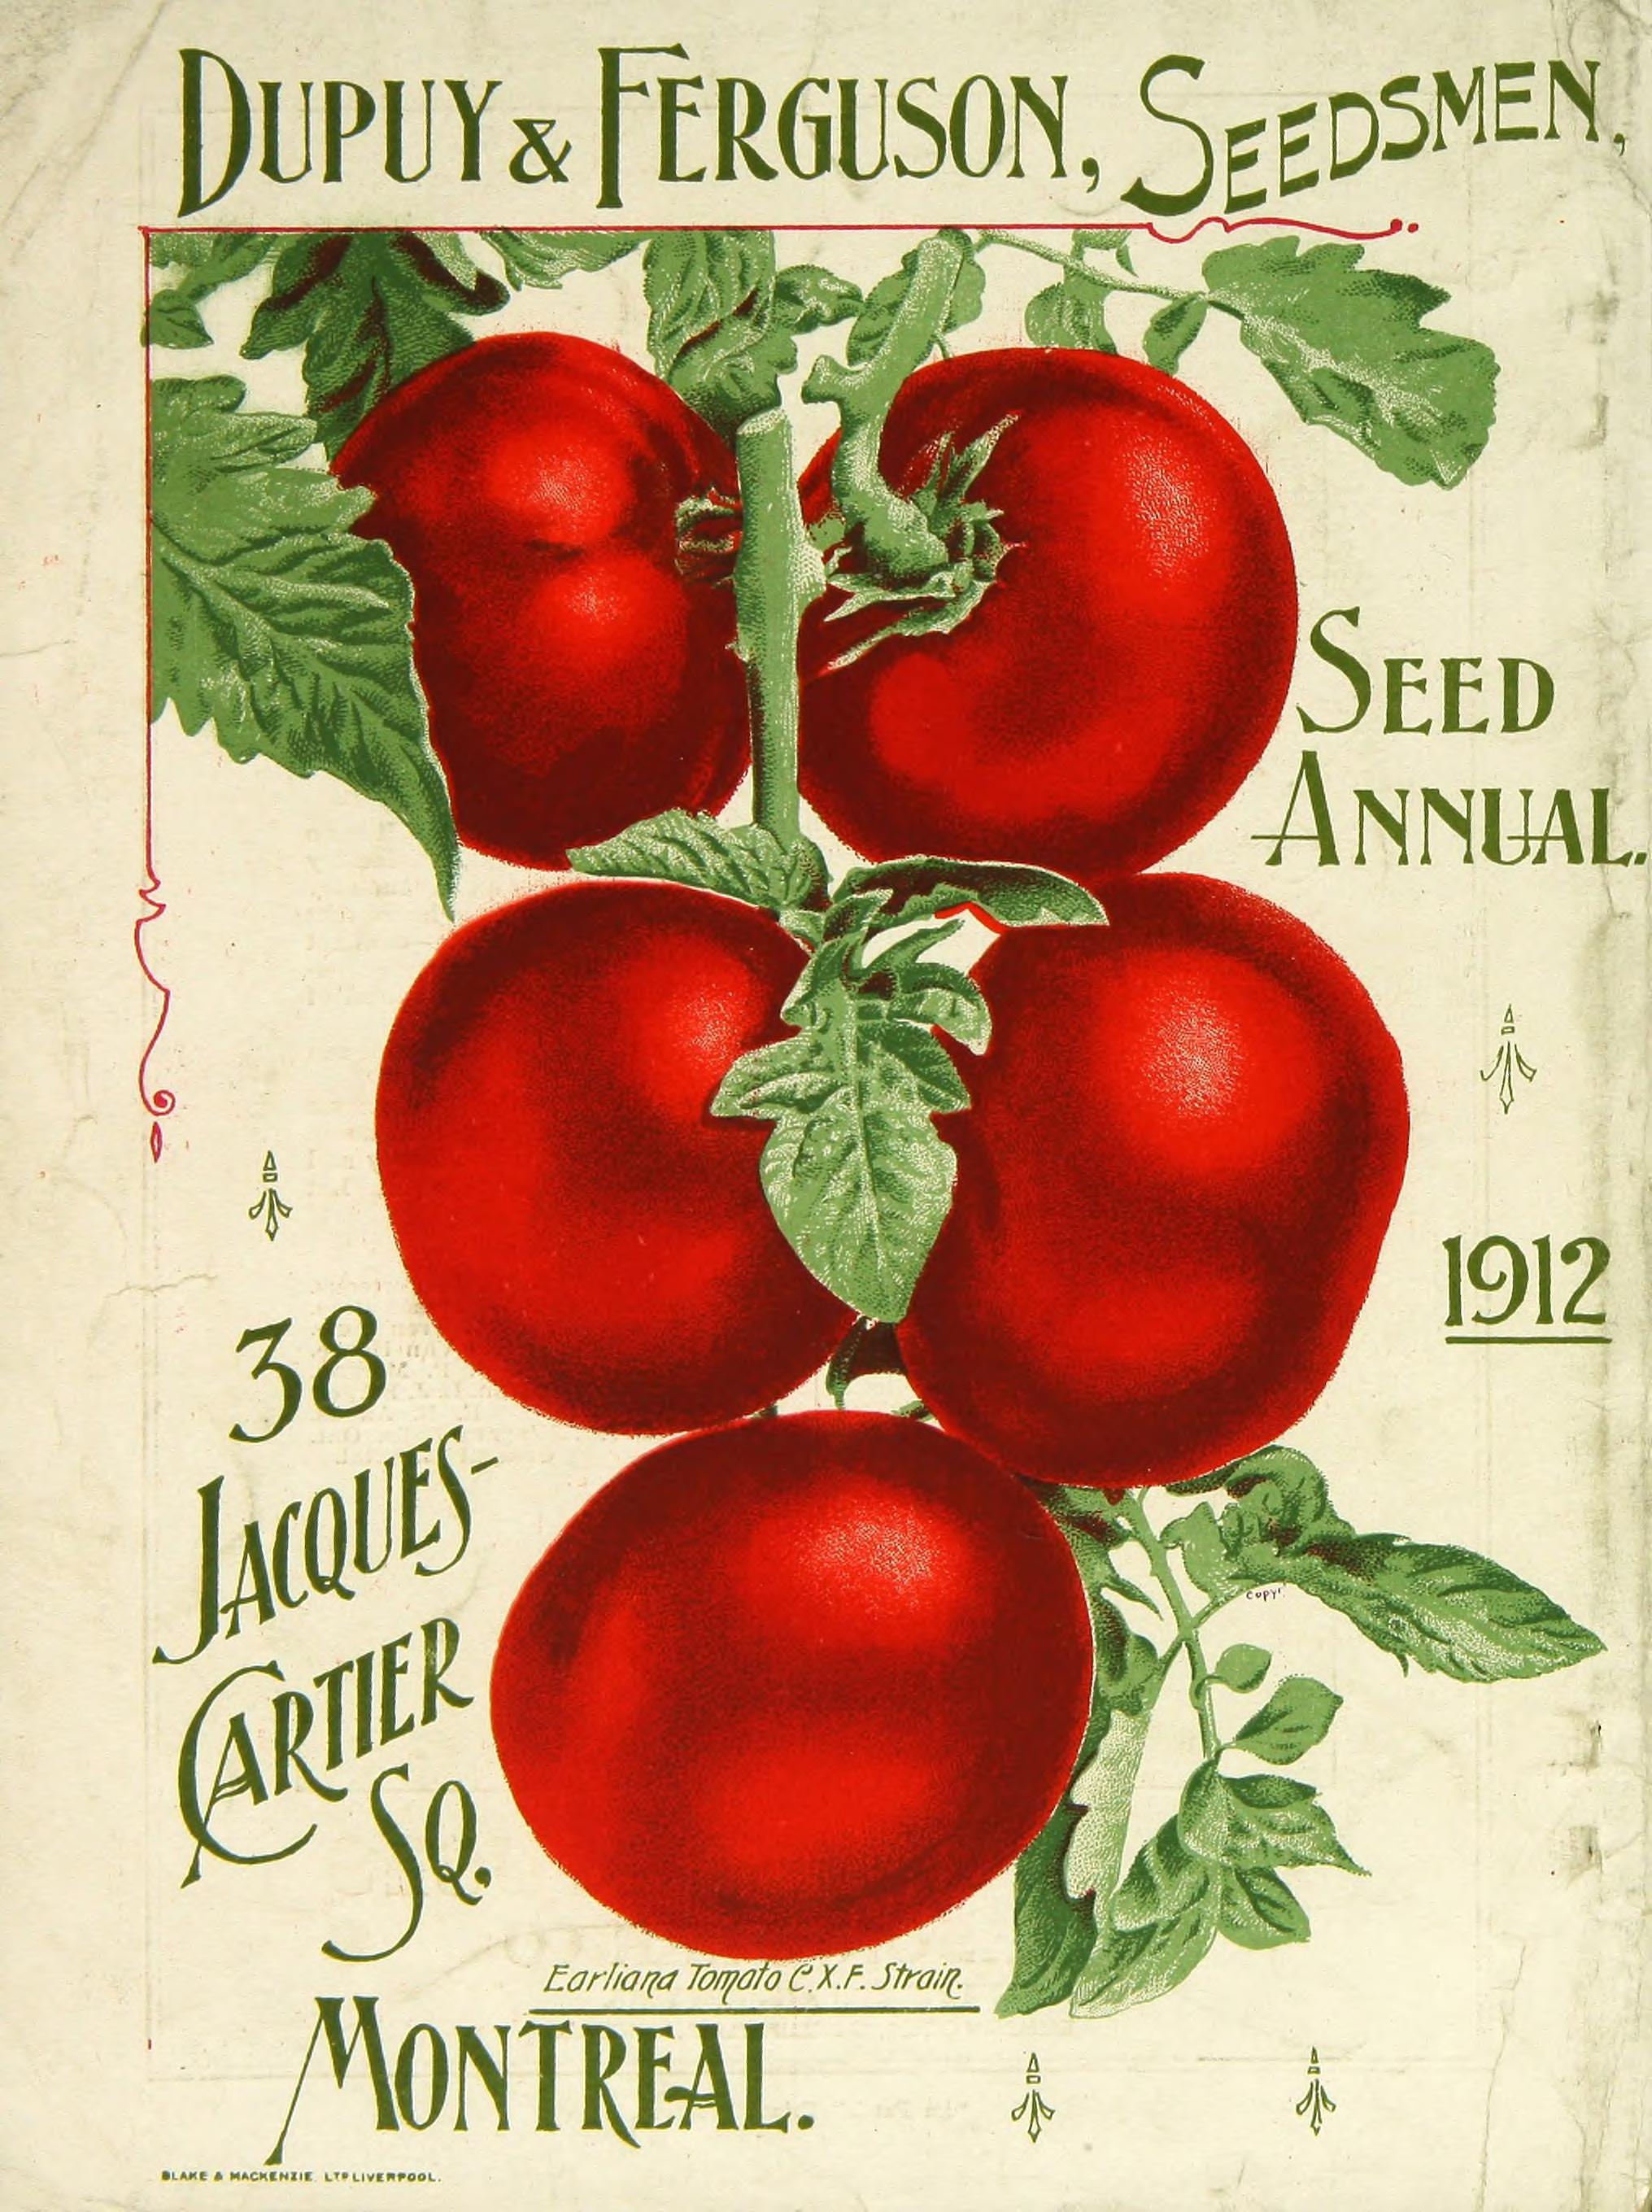 Tomato vs. Dodder, or When Parasitic Plants Attack – awkward botany